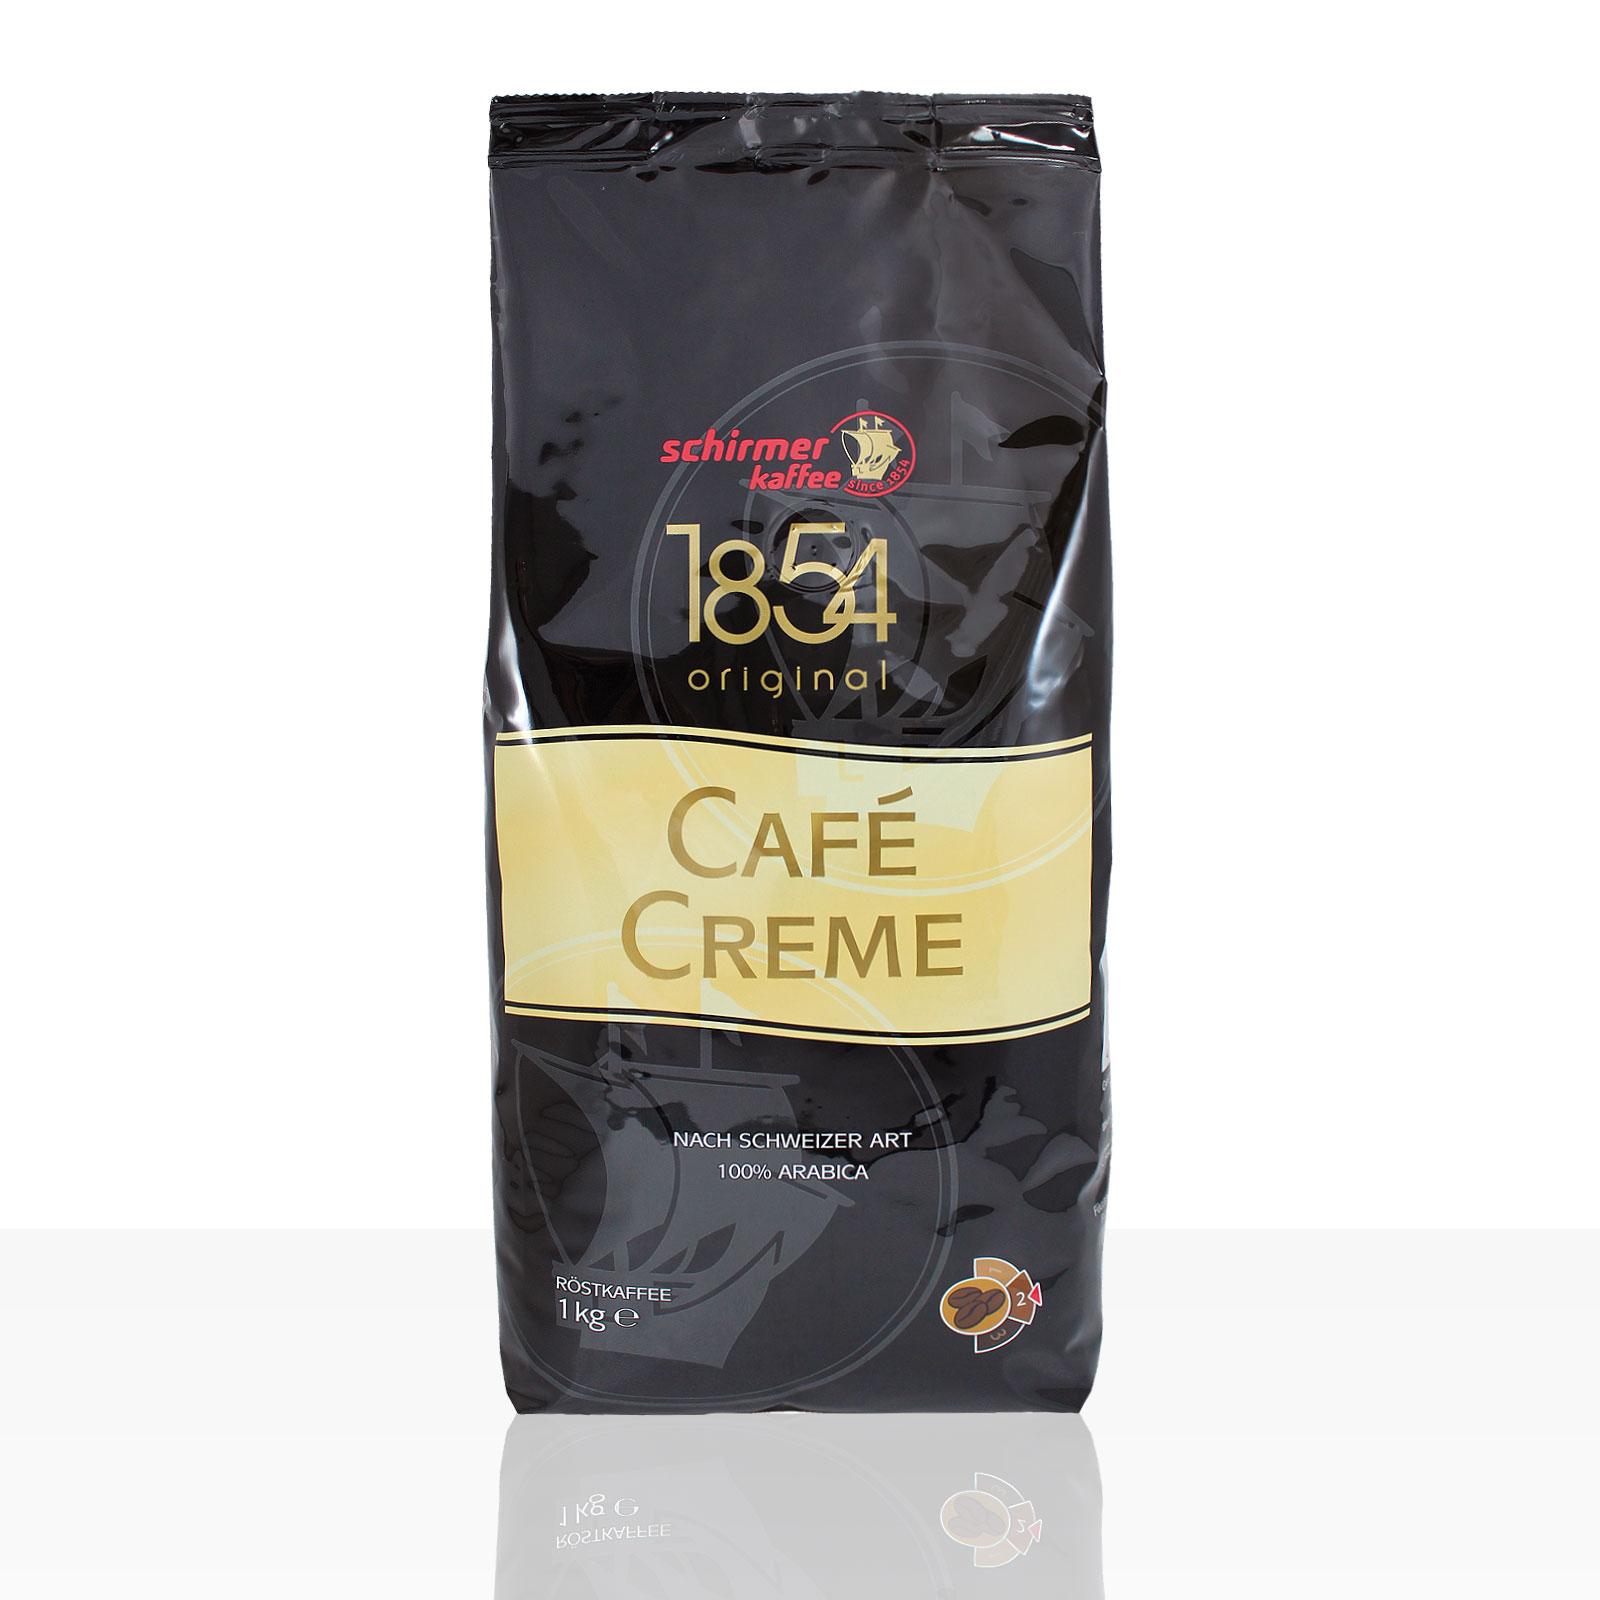 Schirmer Cafe Creme 1854 - 8 x 1kg ganze Kaffee-Bohne, 100% Arabica